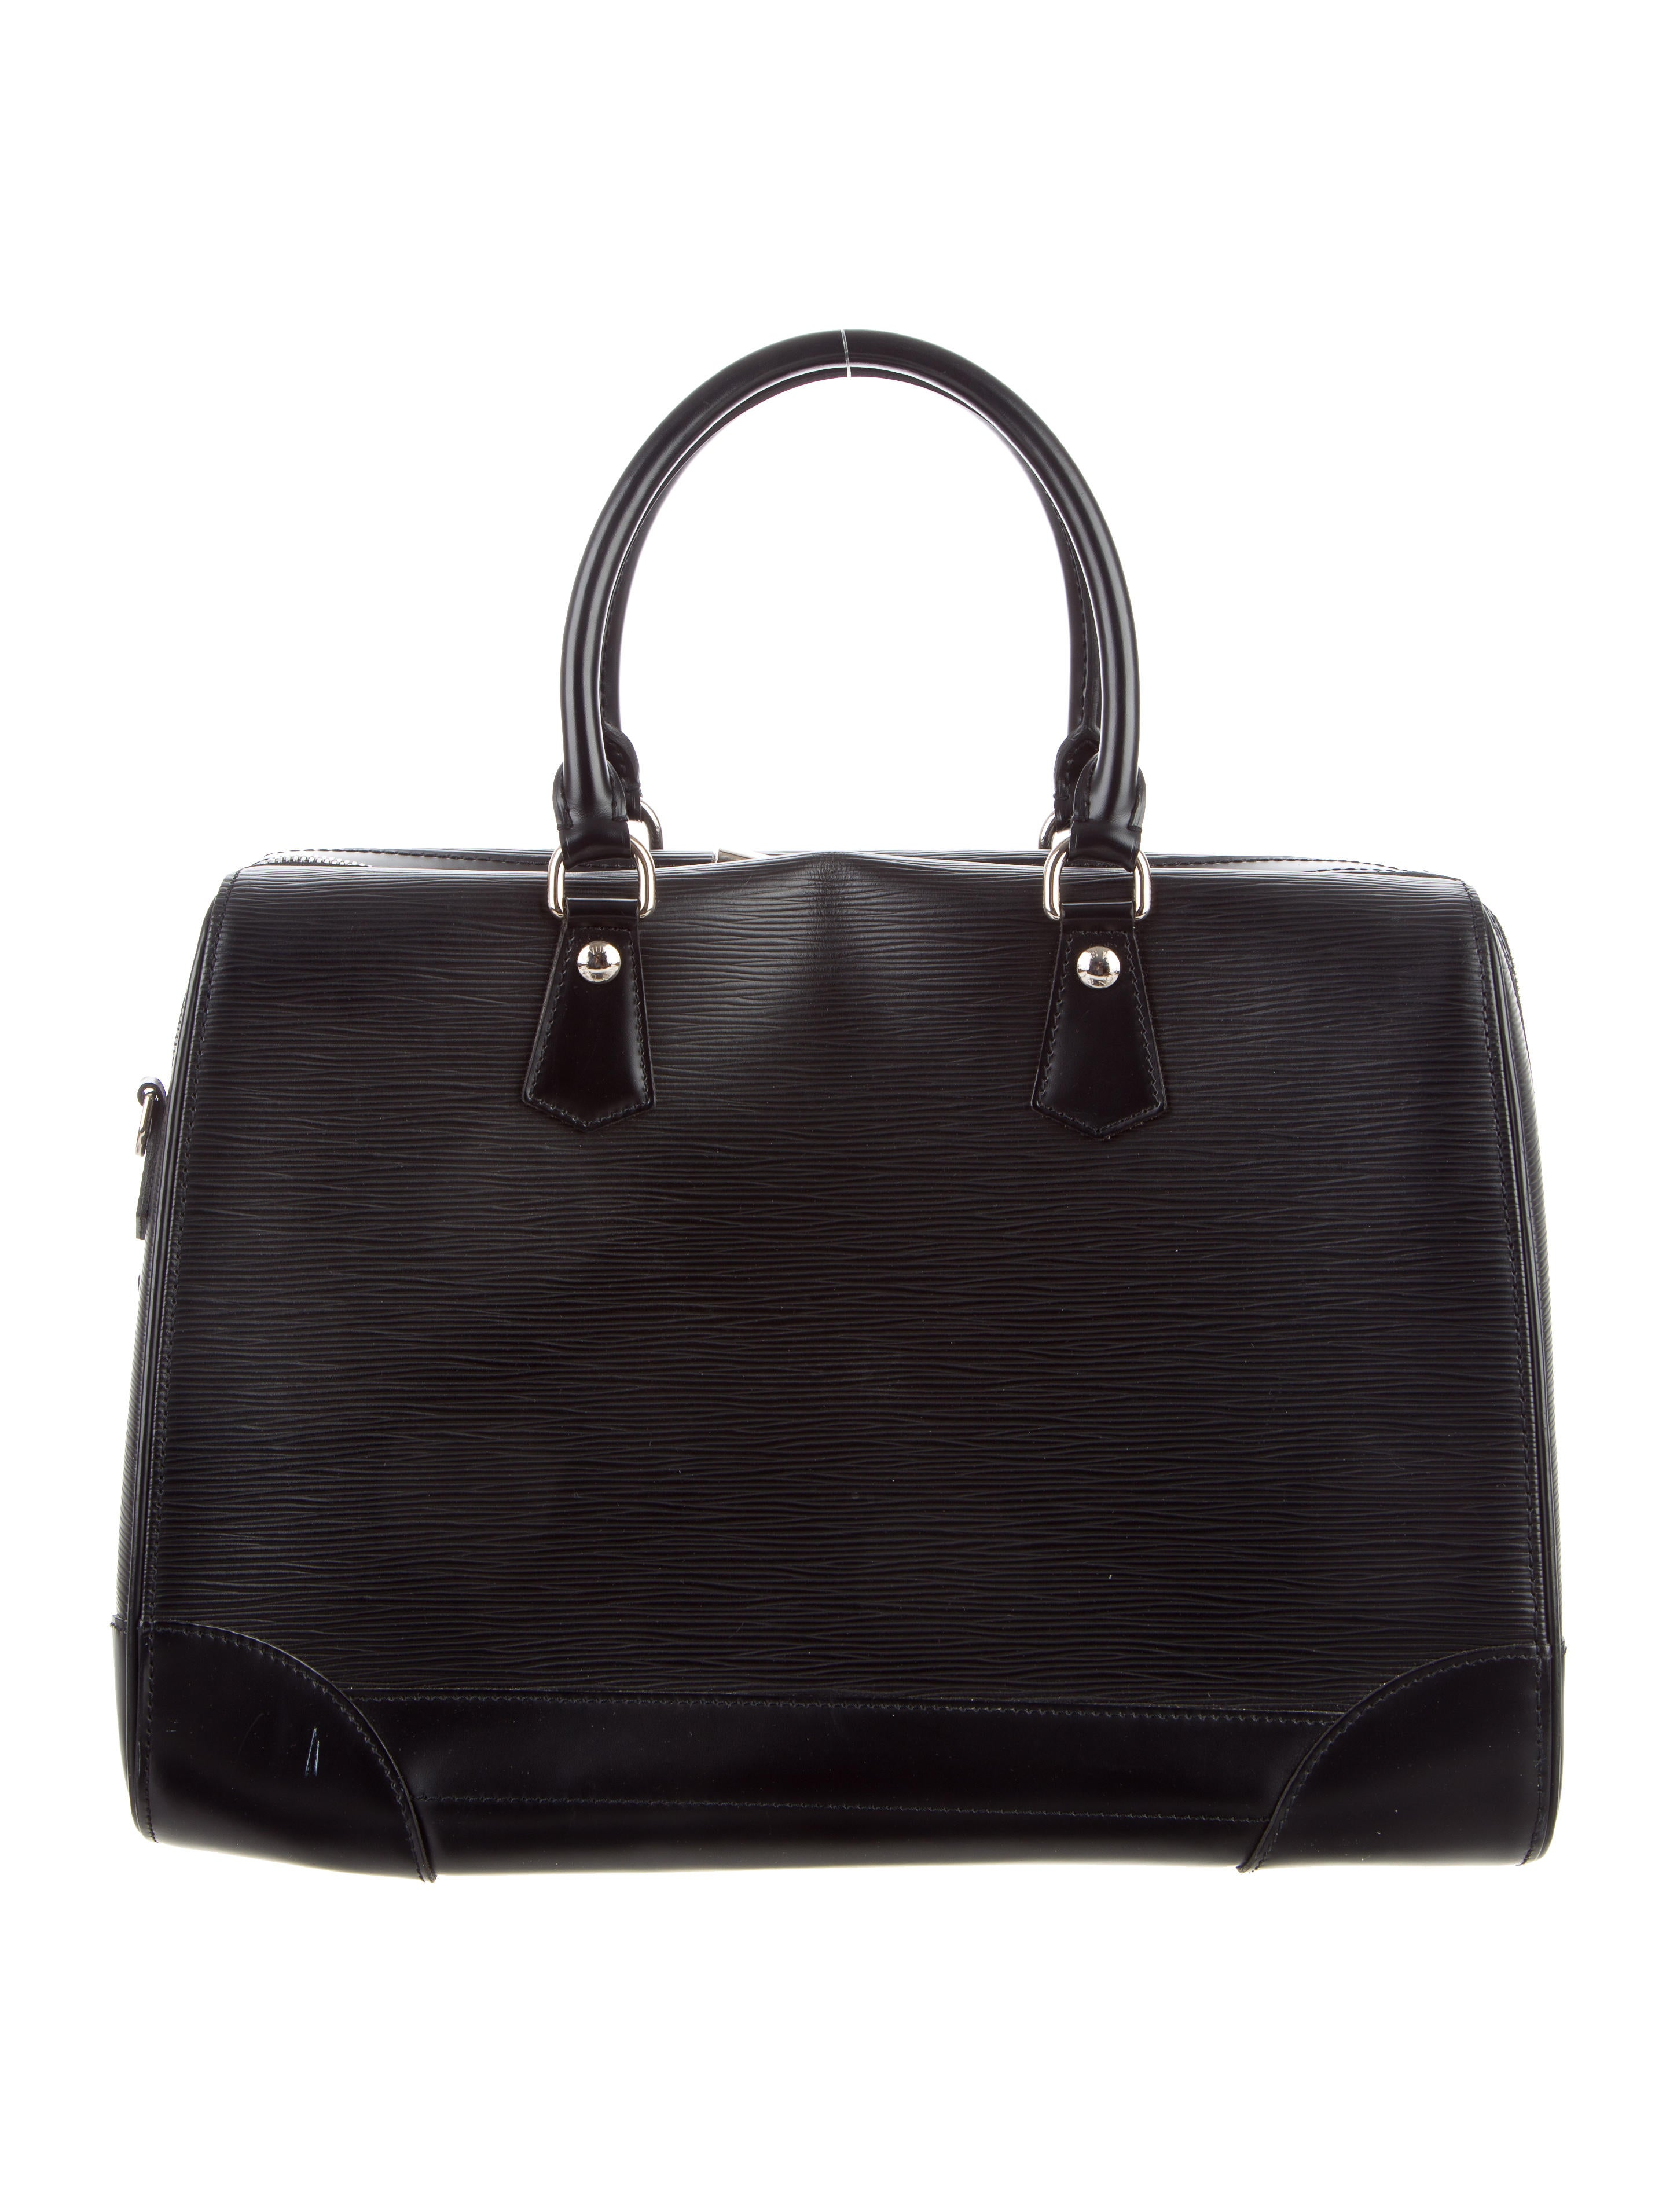 louis vuitton epi sac de voyage bourget handbags lou104823 the realreal. Black Bedroom Furniture Sets. Home Design Ideas